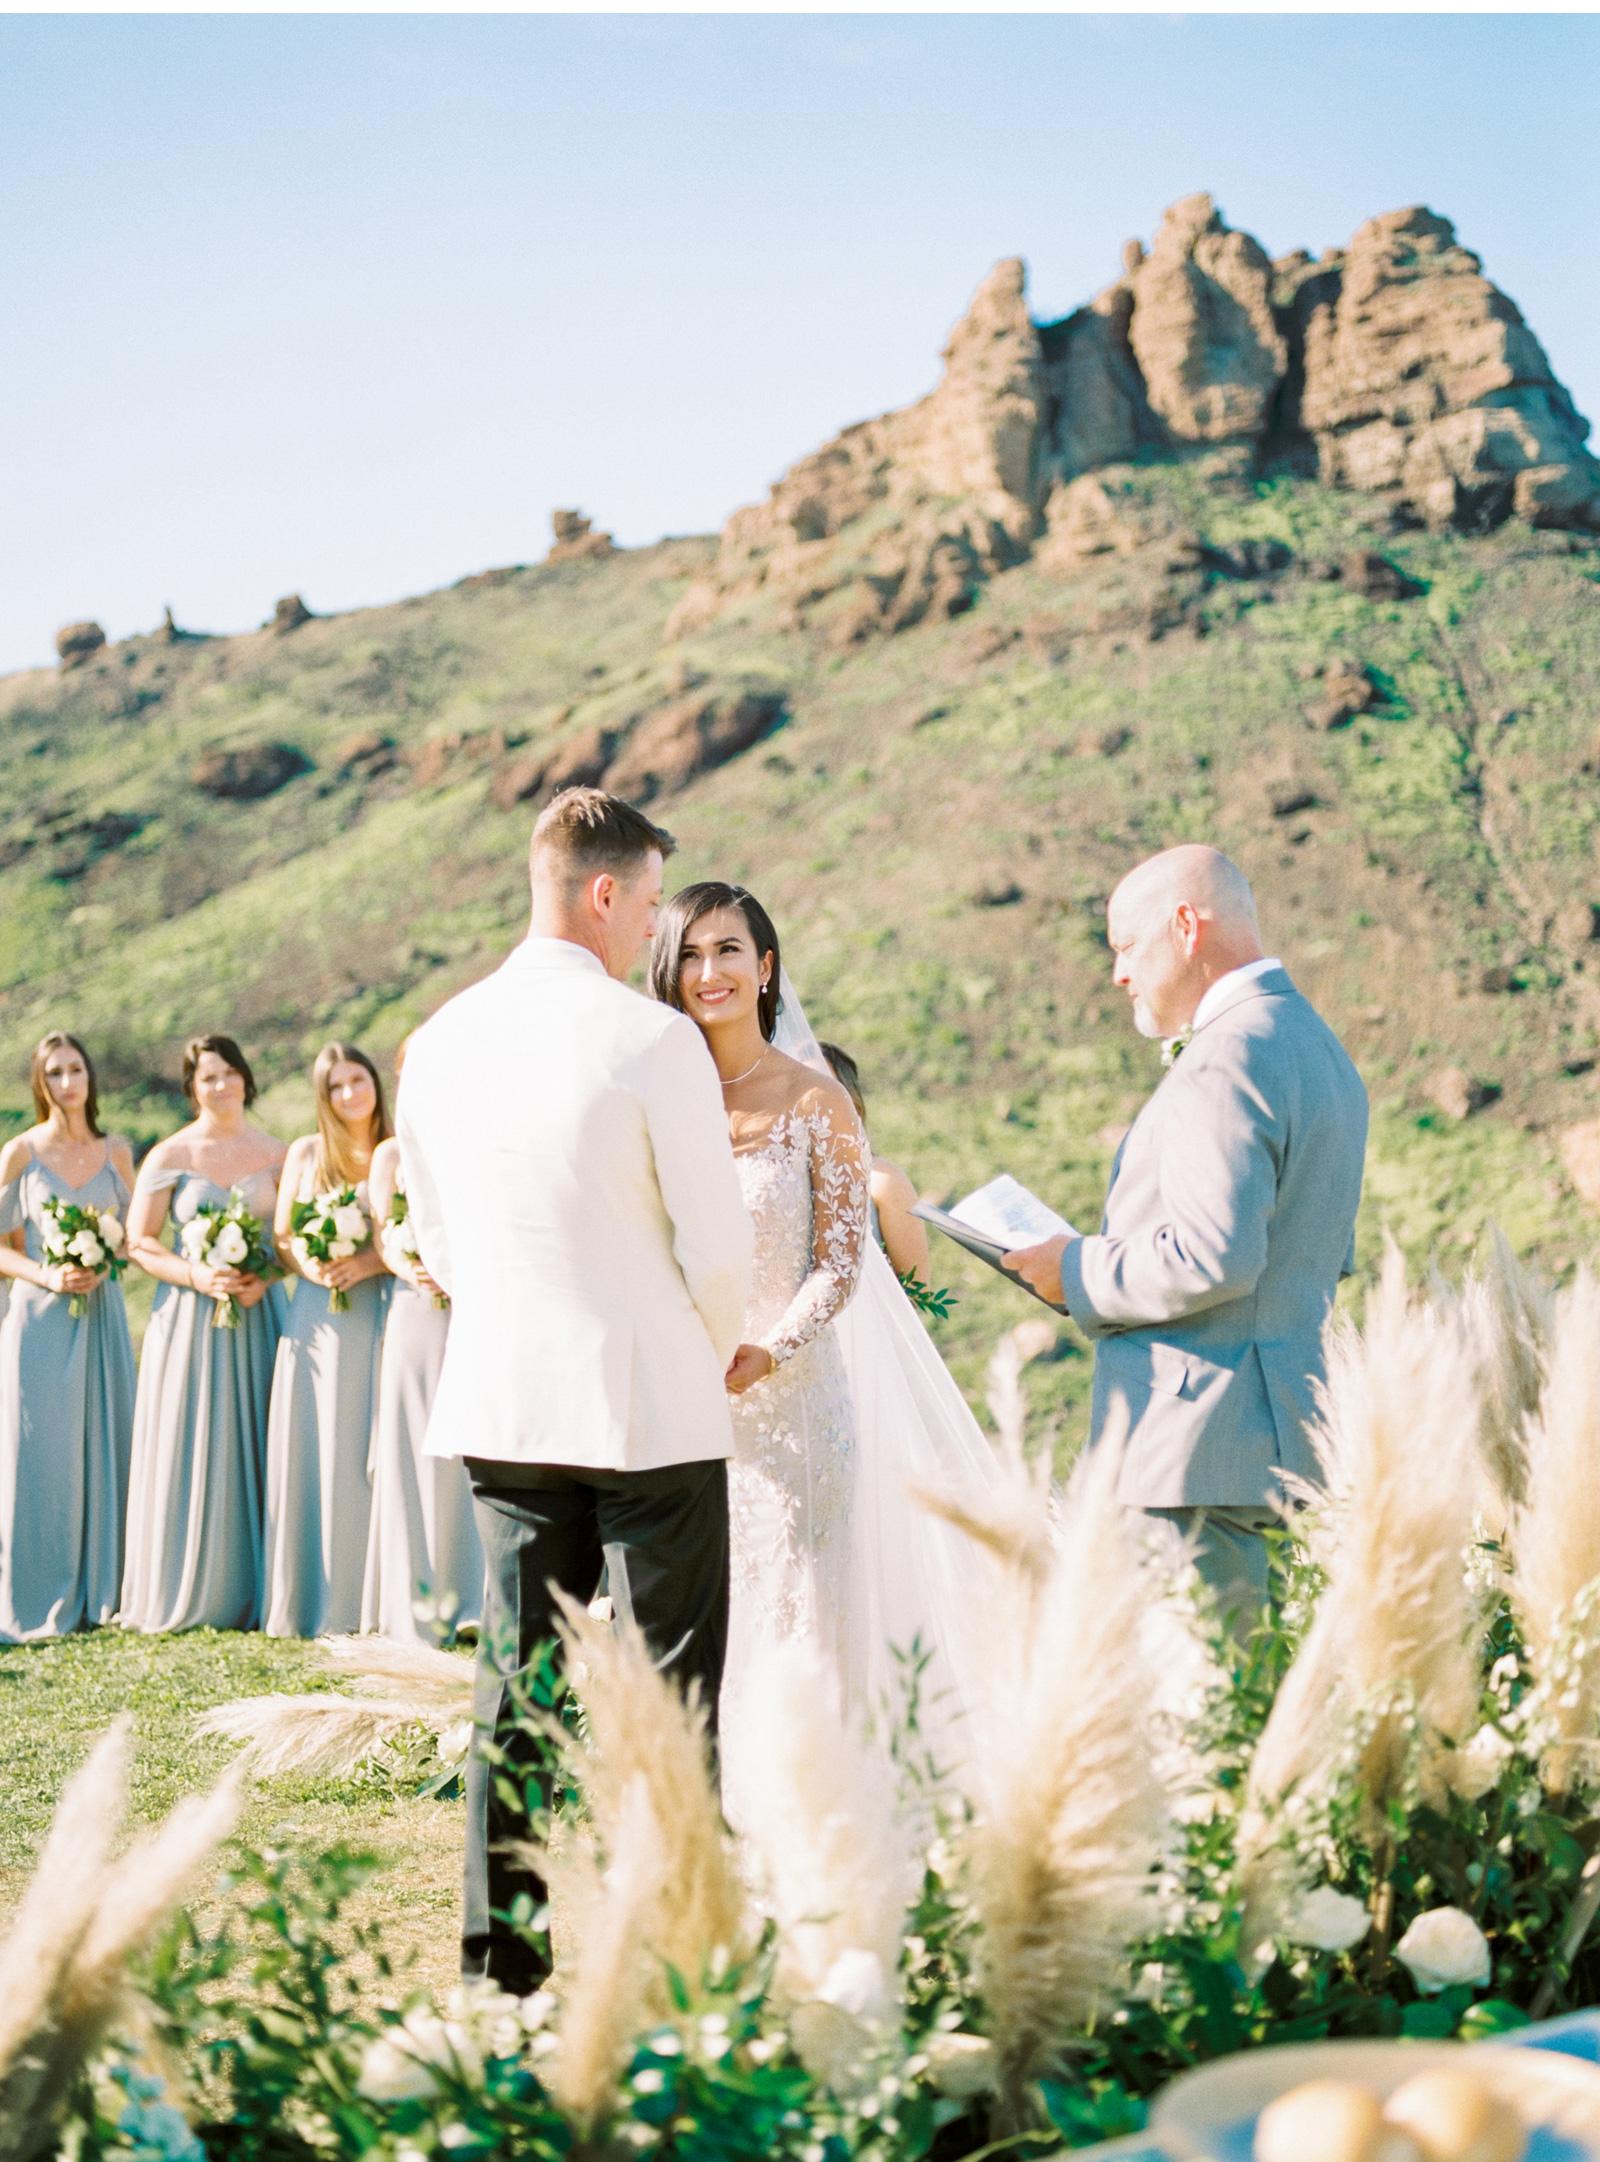 West-Coast-Weddings-Southern-California-Wedding-Photographer-Style-Me-Pretty-Fine-Art-Triunfo-Creek-Malibu-Natalie-Schutt-Photography_12.jpg